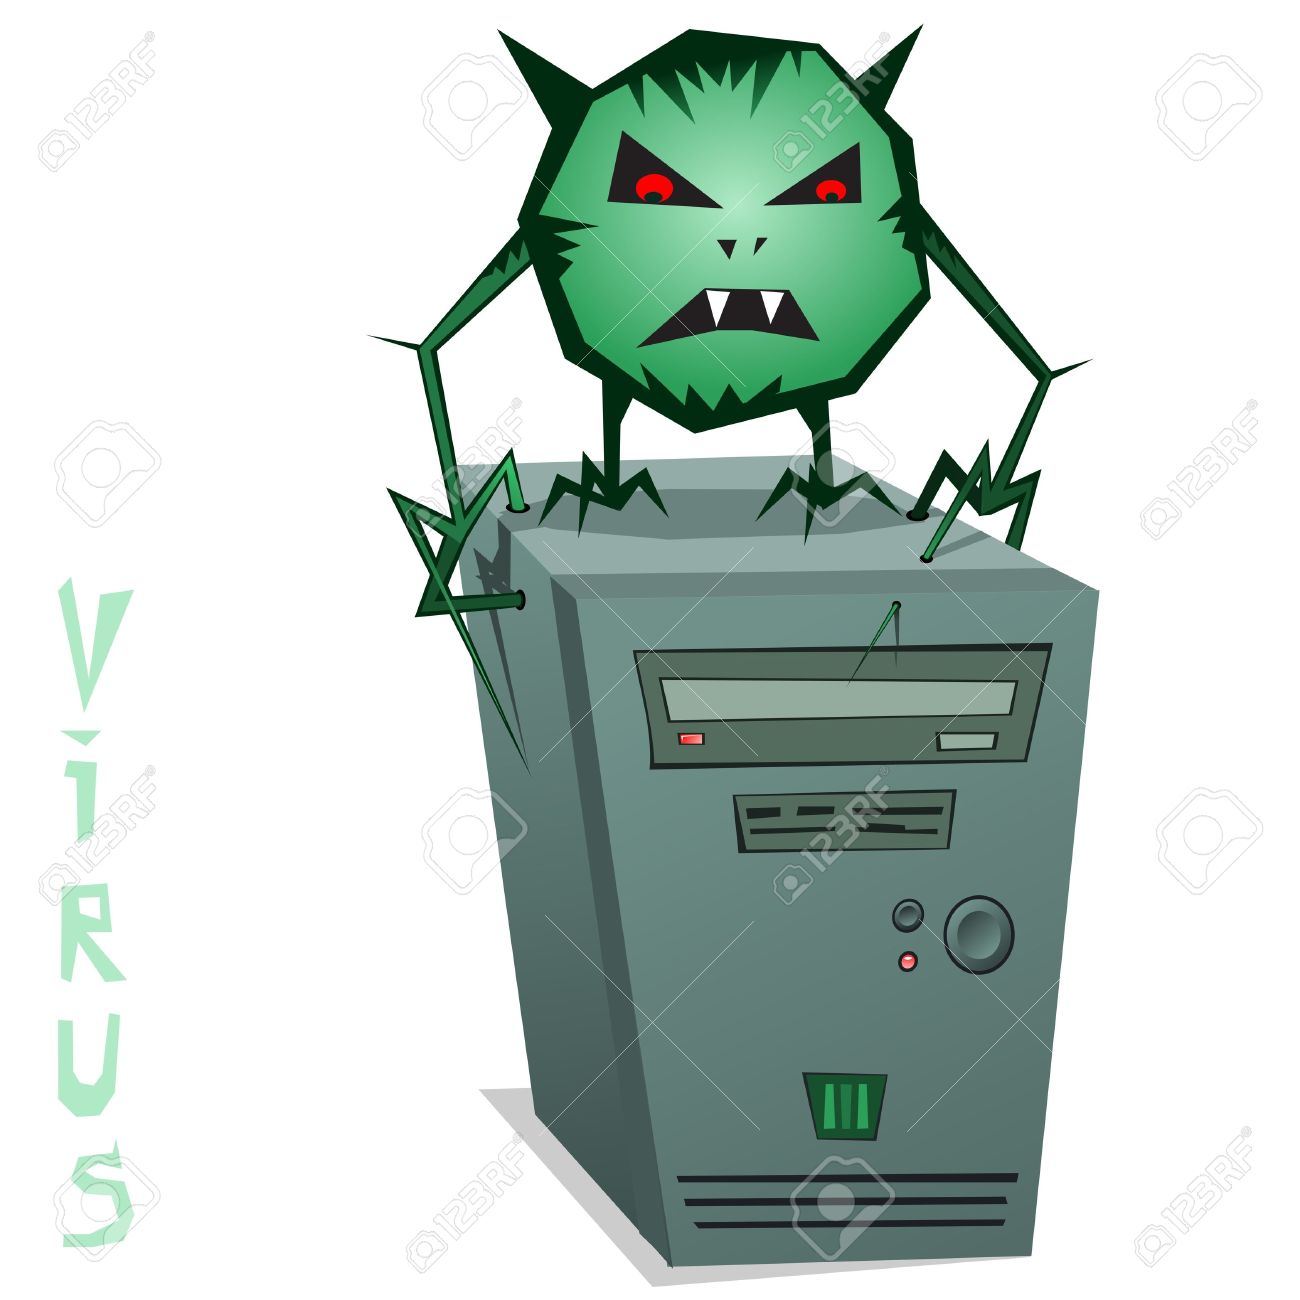 Computer Virus! Illustration Of A Computer Virus. Green Computer.